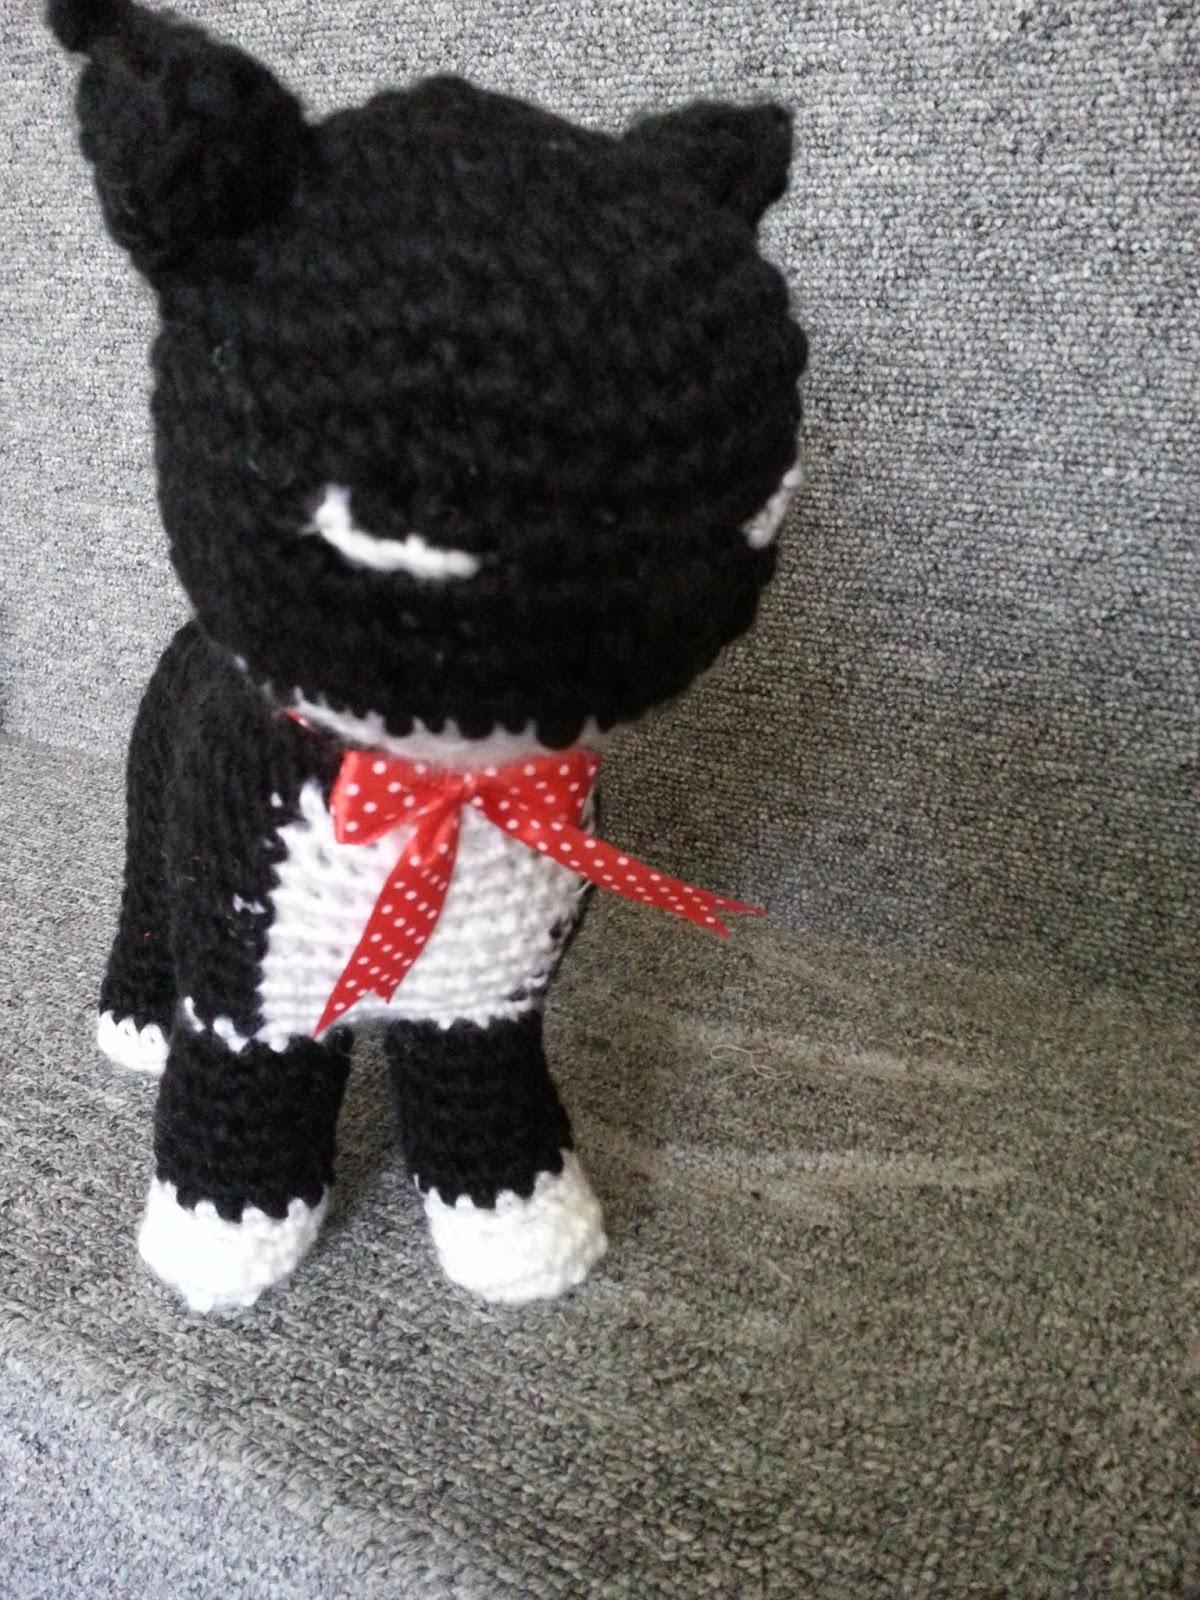 PDF AmiCats Tuxedo Cat amigurumi cat CROCHET PATTERN | Etsy | 1600x1200